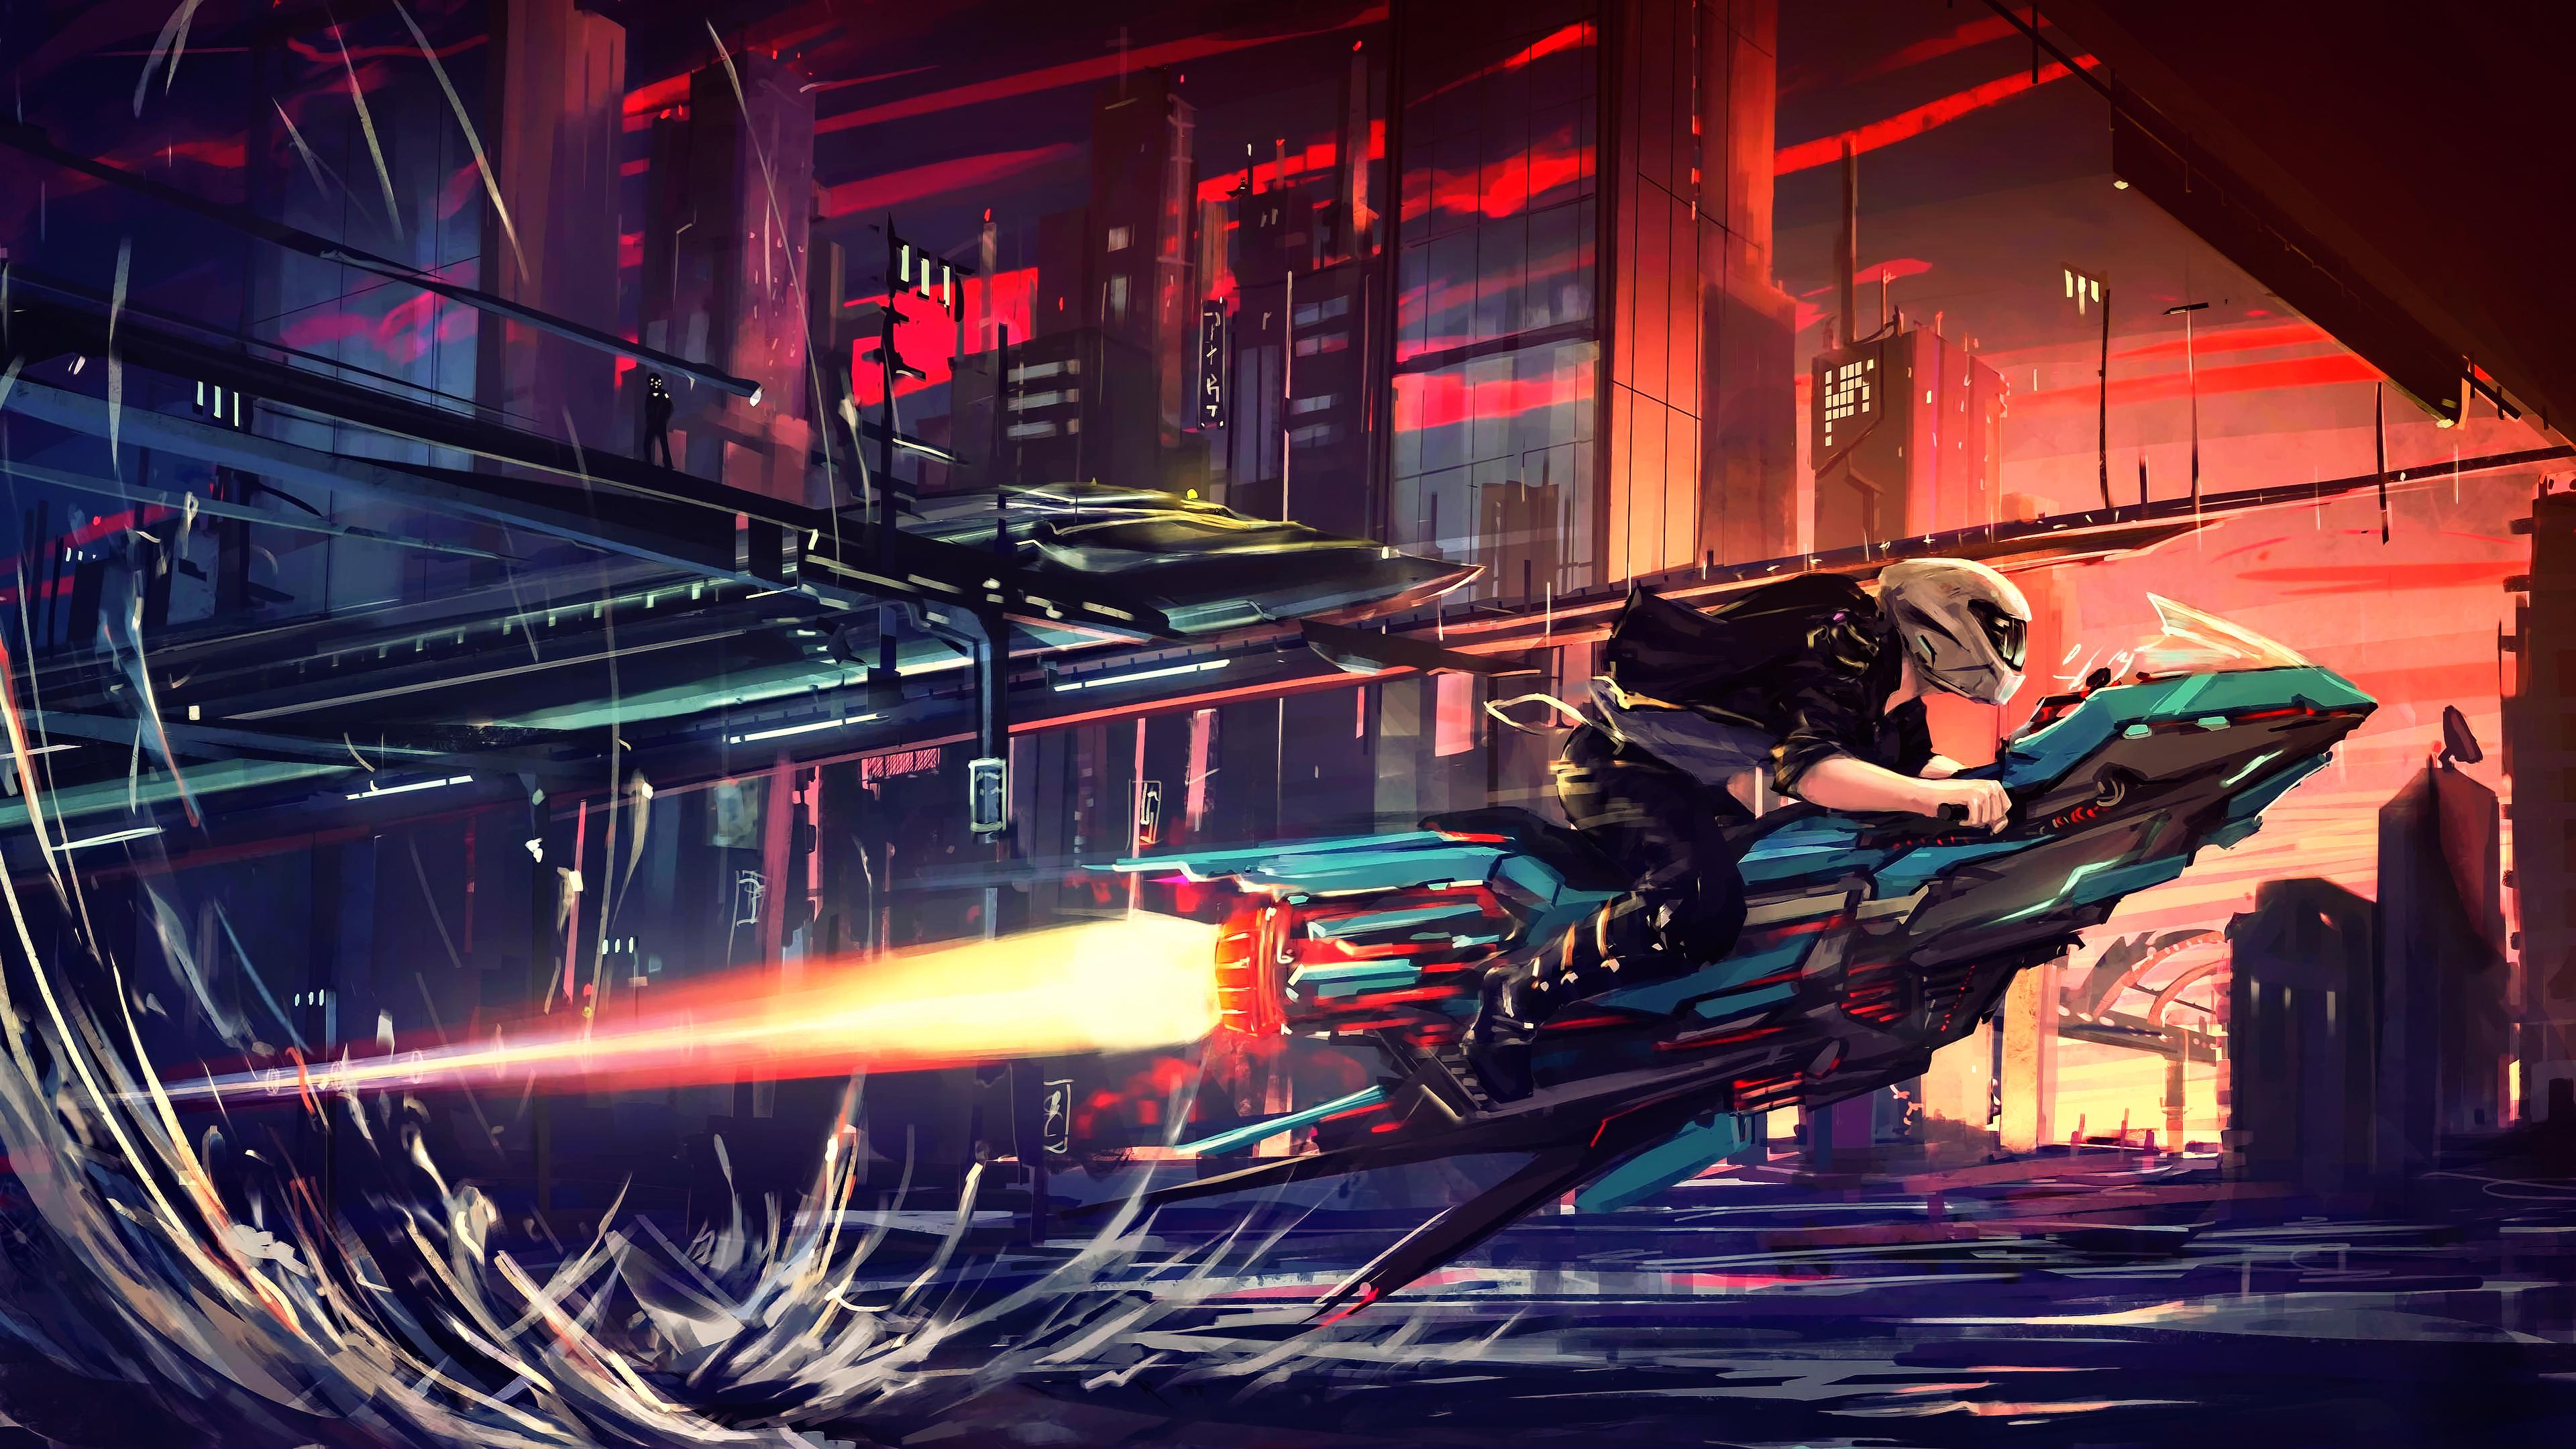 General 3840x2160 science fiction digital art concept art artwork futuristic fantasy art fan art 3D CGI sunset spaceship cyberpunk cyber cityscape city